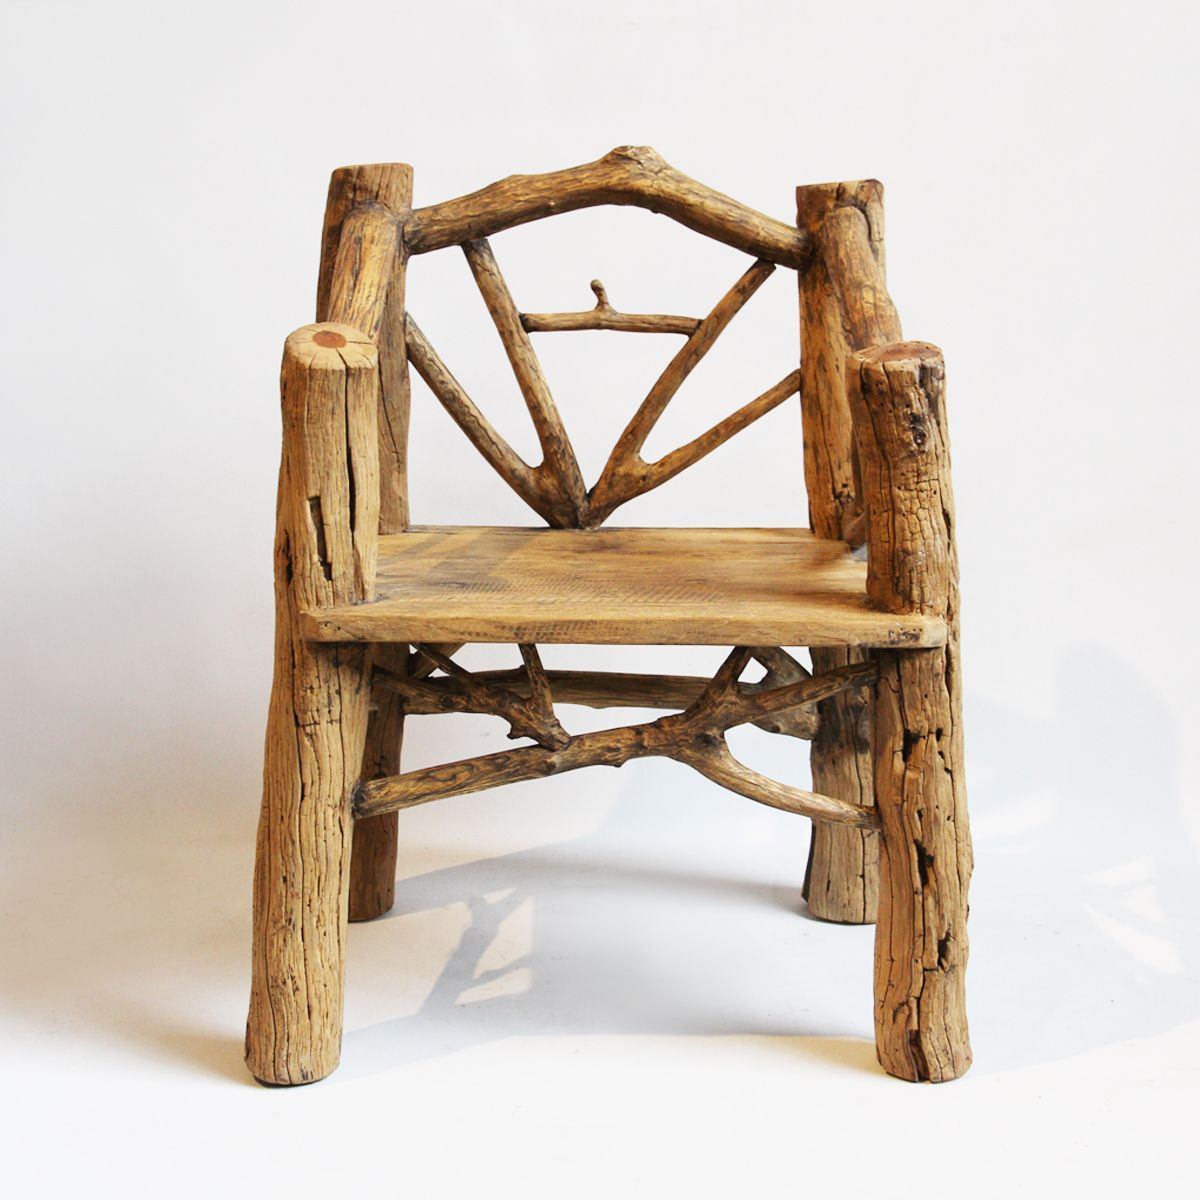 Astonishing Old Log Branch Stump Chair Rustic Farmhouse In 2019 Dailytribune Chair Design For Home Dailytribuneorg